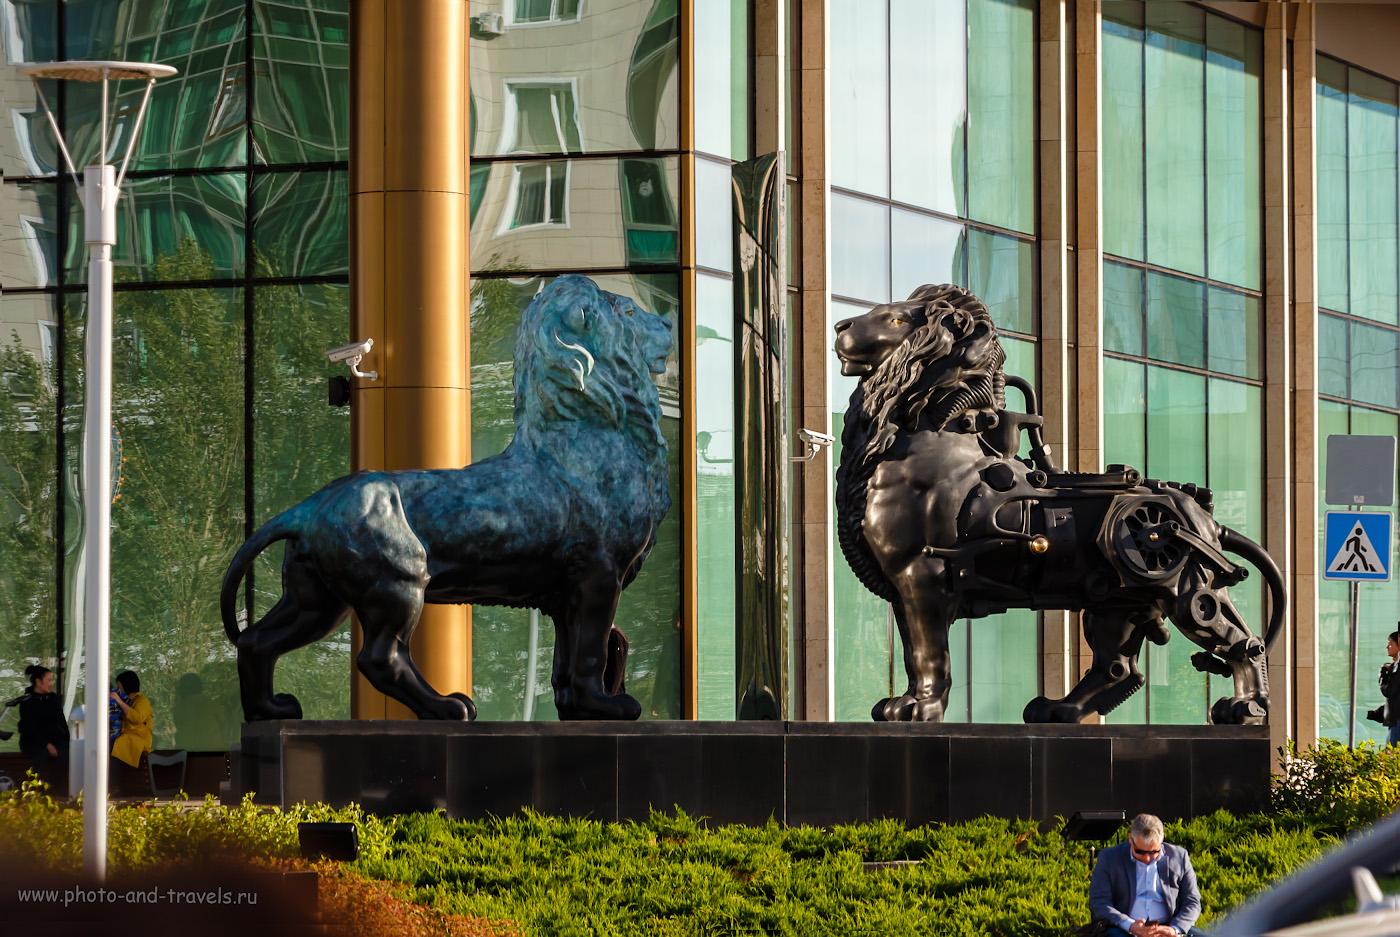 Фотография 19. Скульптурная группа «Зеркало, о моё зеркало» у входа в БЦ «Talan Towers» в Астане. 1/160, +0.3, 5.6, 200, 102.